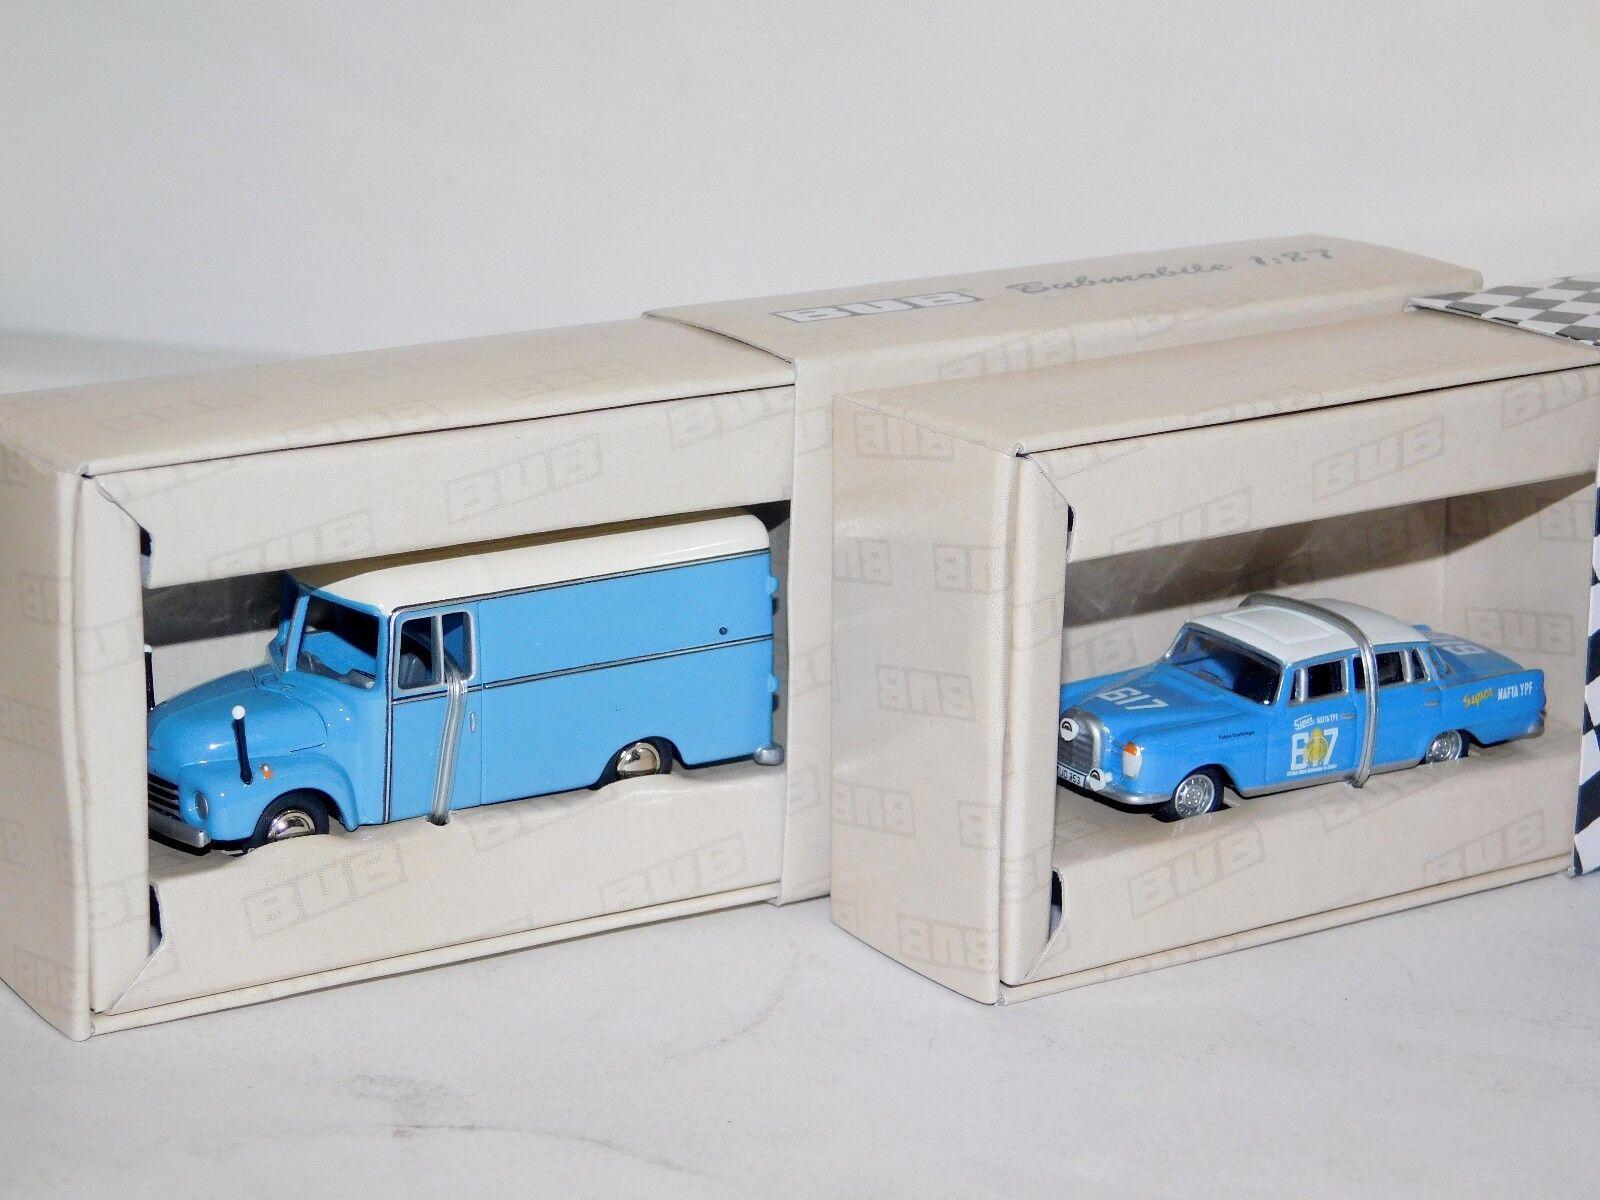 Lote de 2  OPEL Blitz azul y Mercedes 300SE plataina 1964 Bub 6875 & 6271 1 87